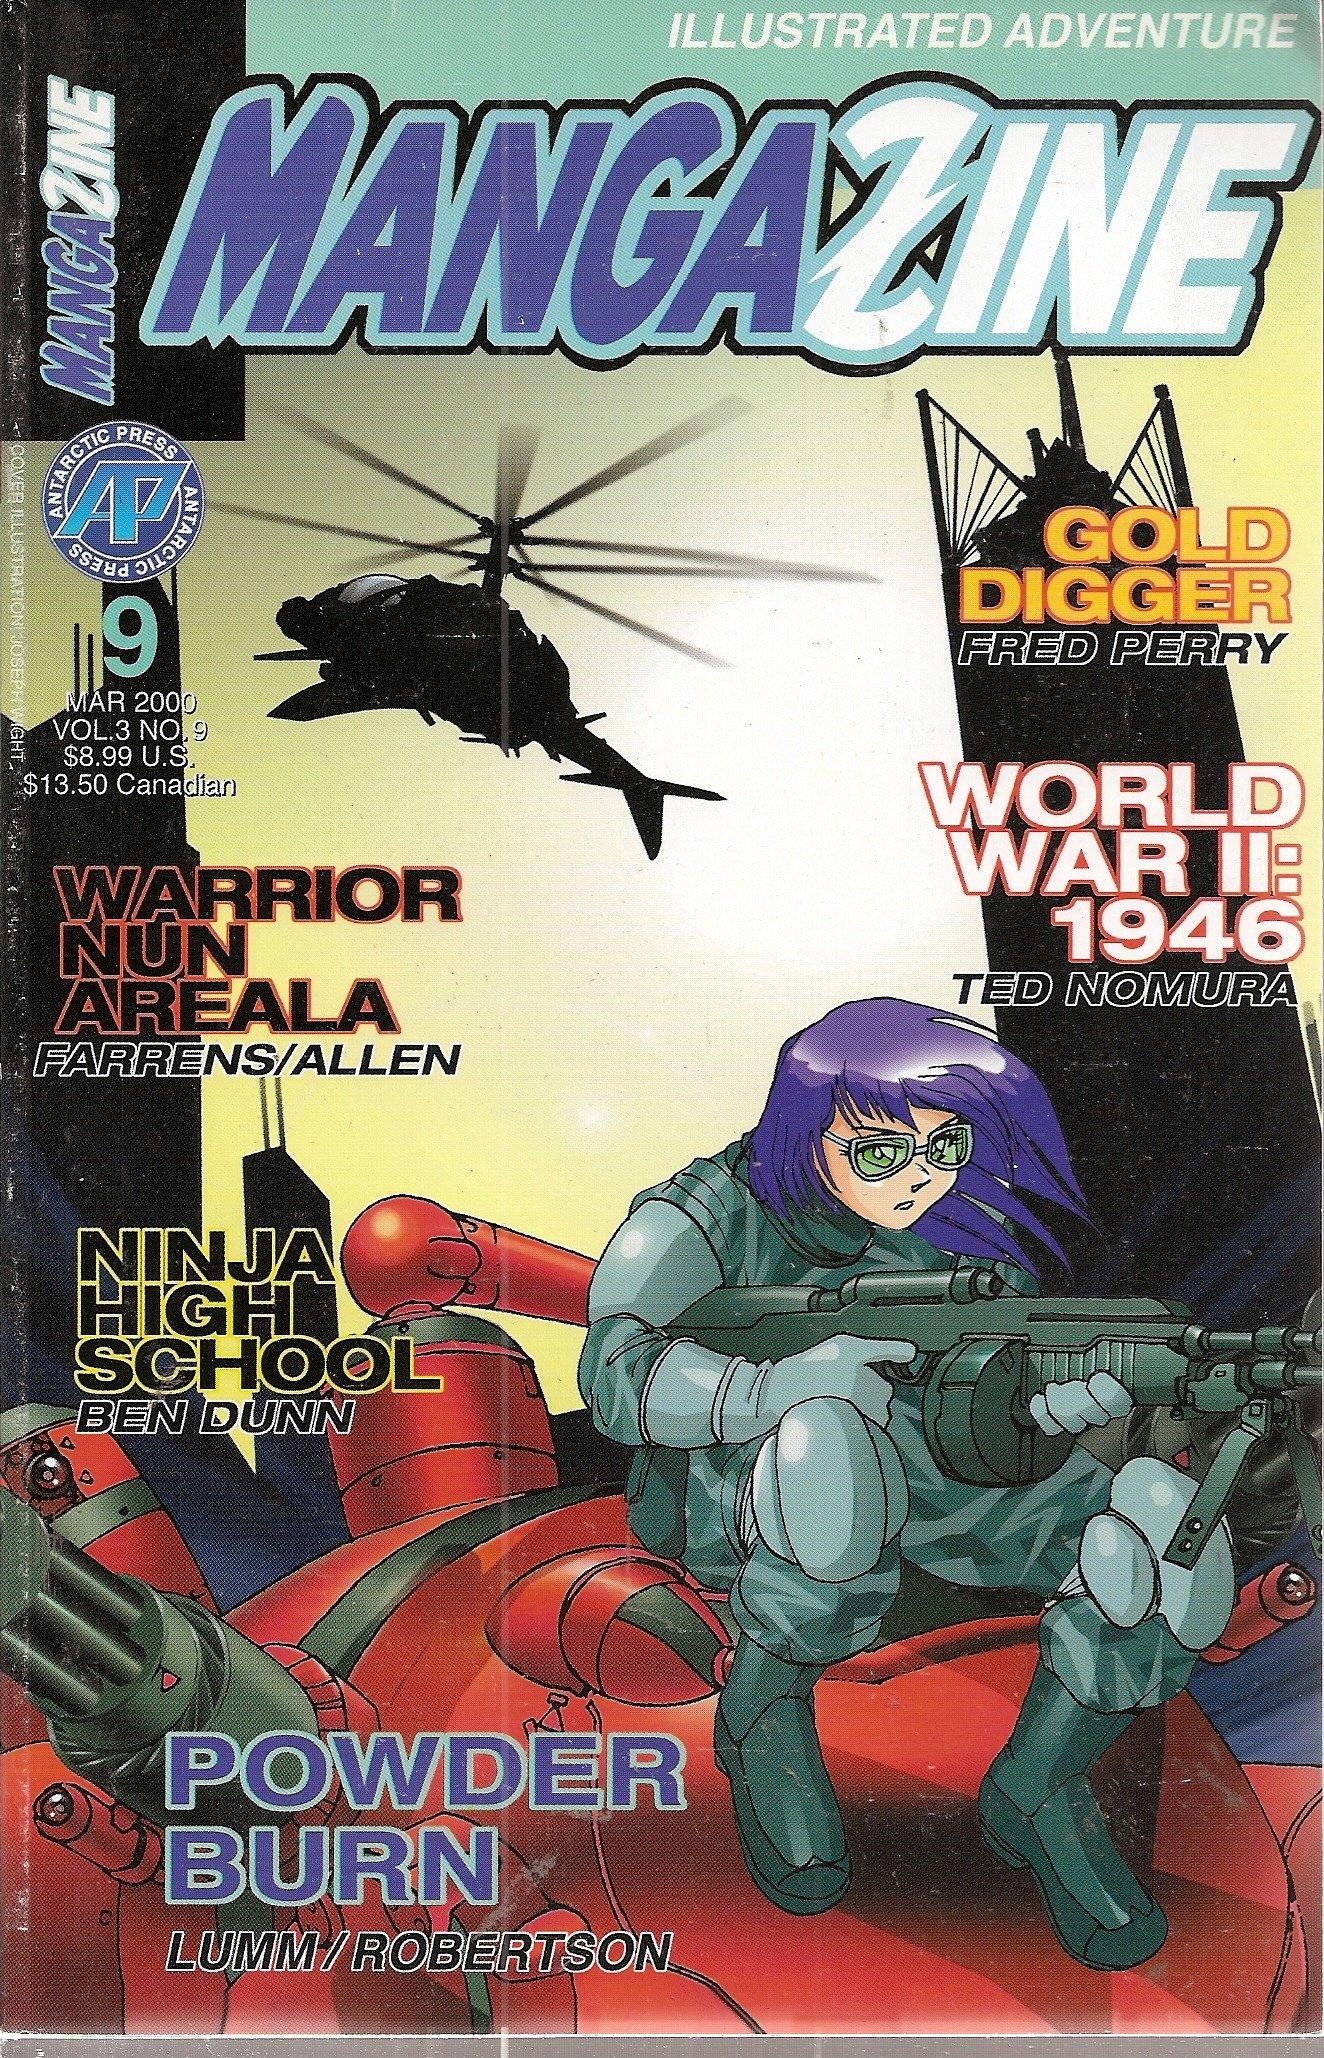 Mangazine #9 (Gold Digger, Ninja High School, World War II ...